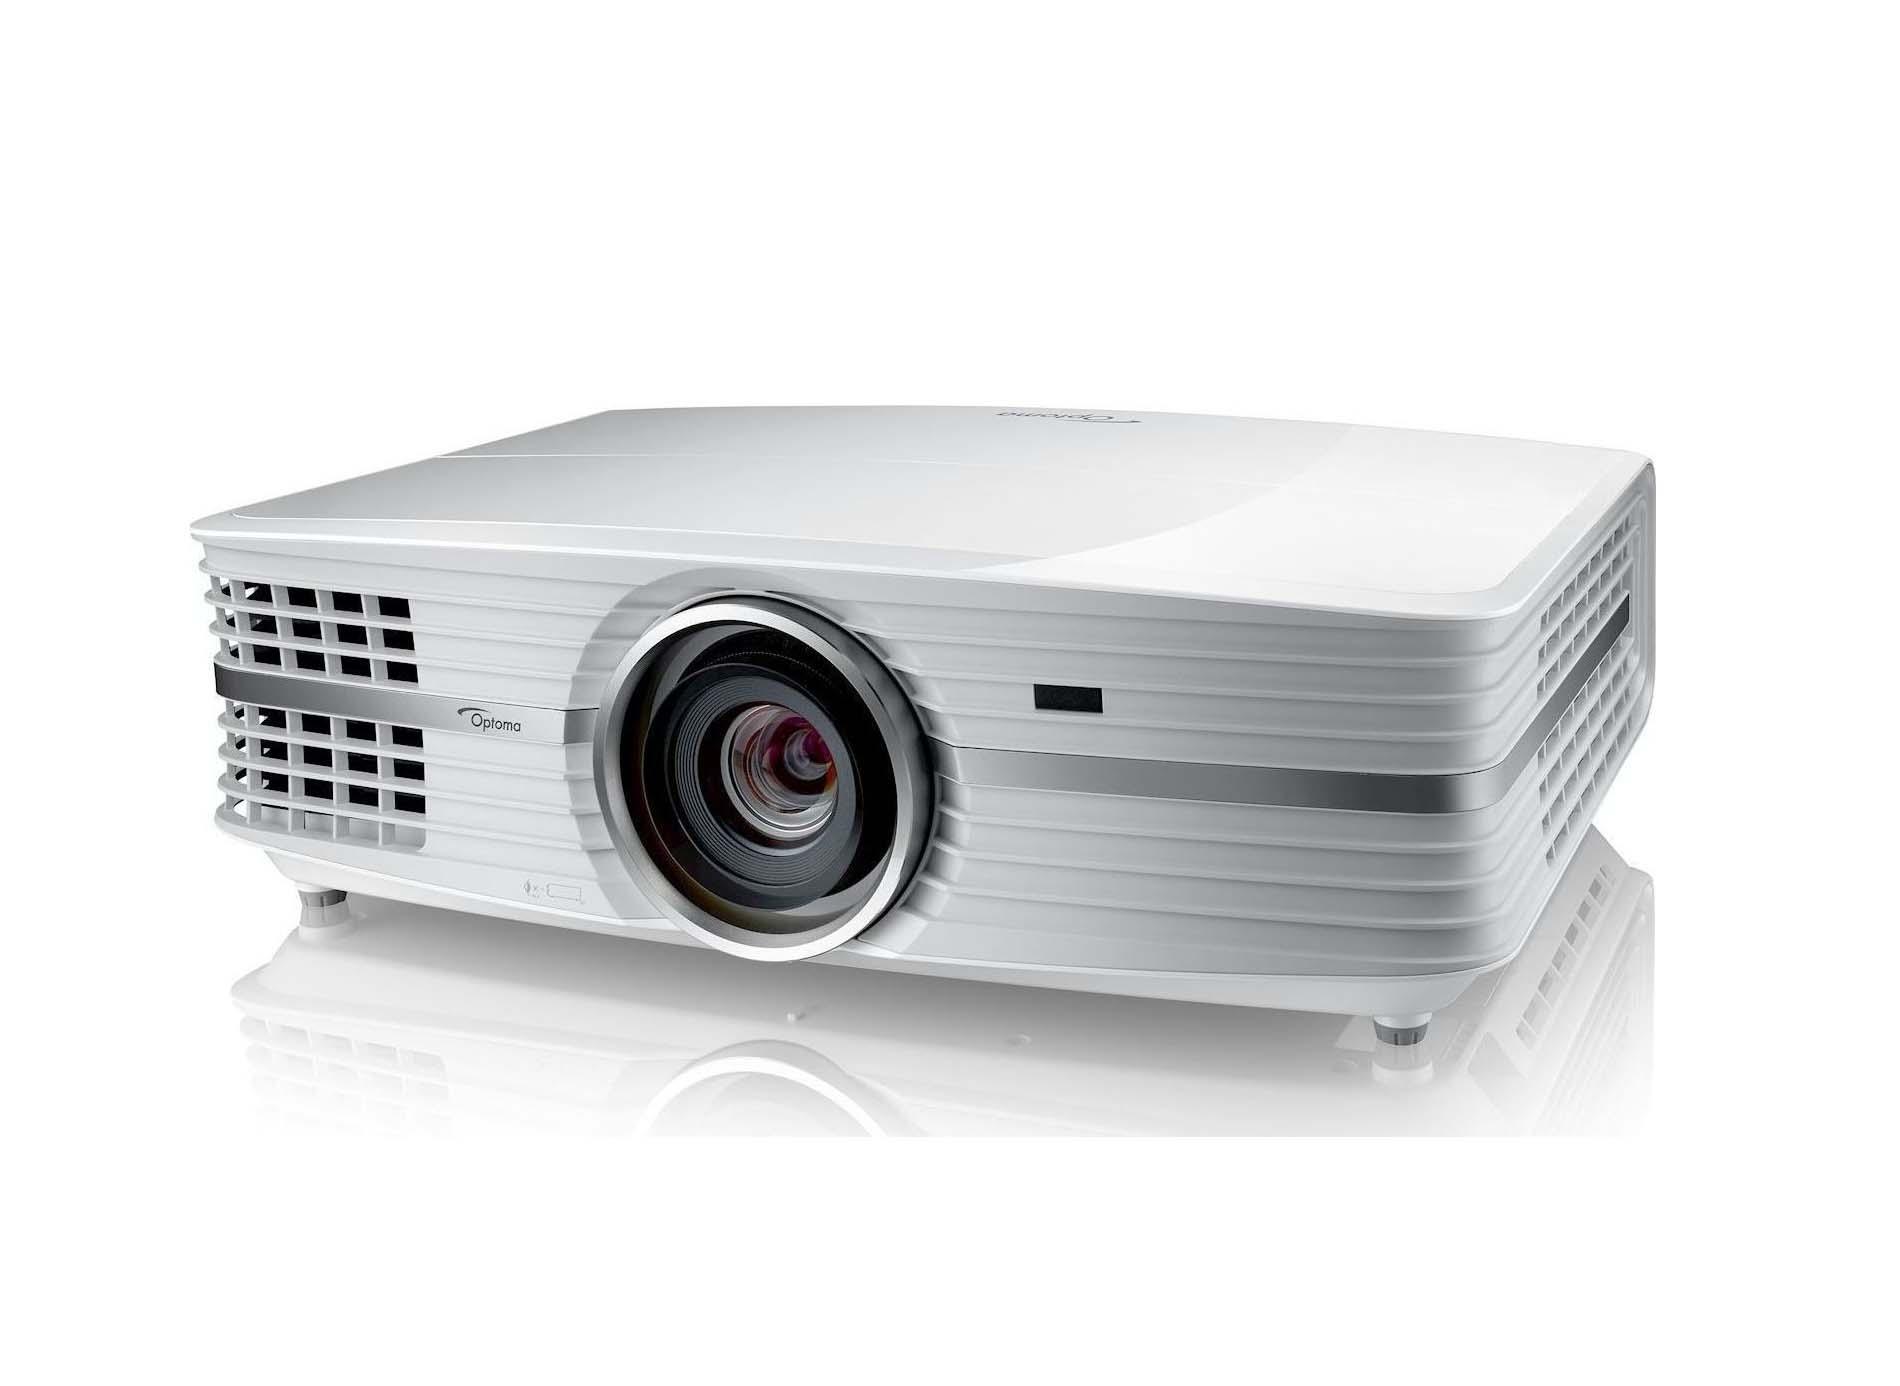 Optoma UHD550X 4K Projector Πληρωμή έως 24 δόσεις